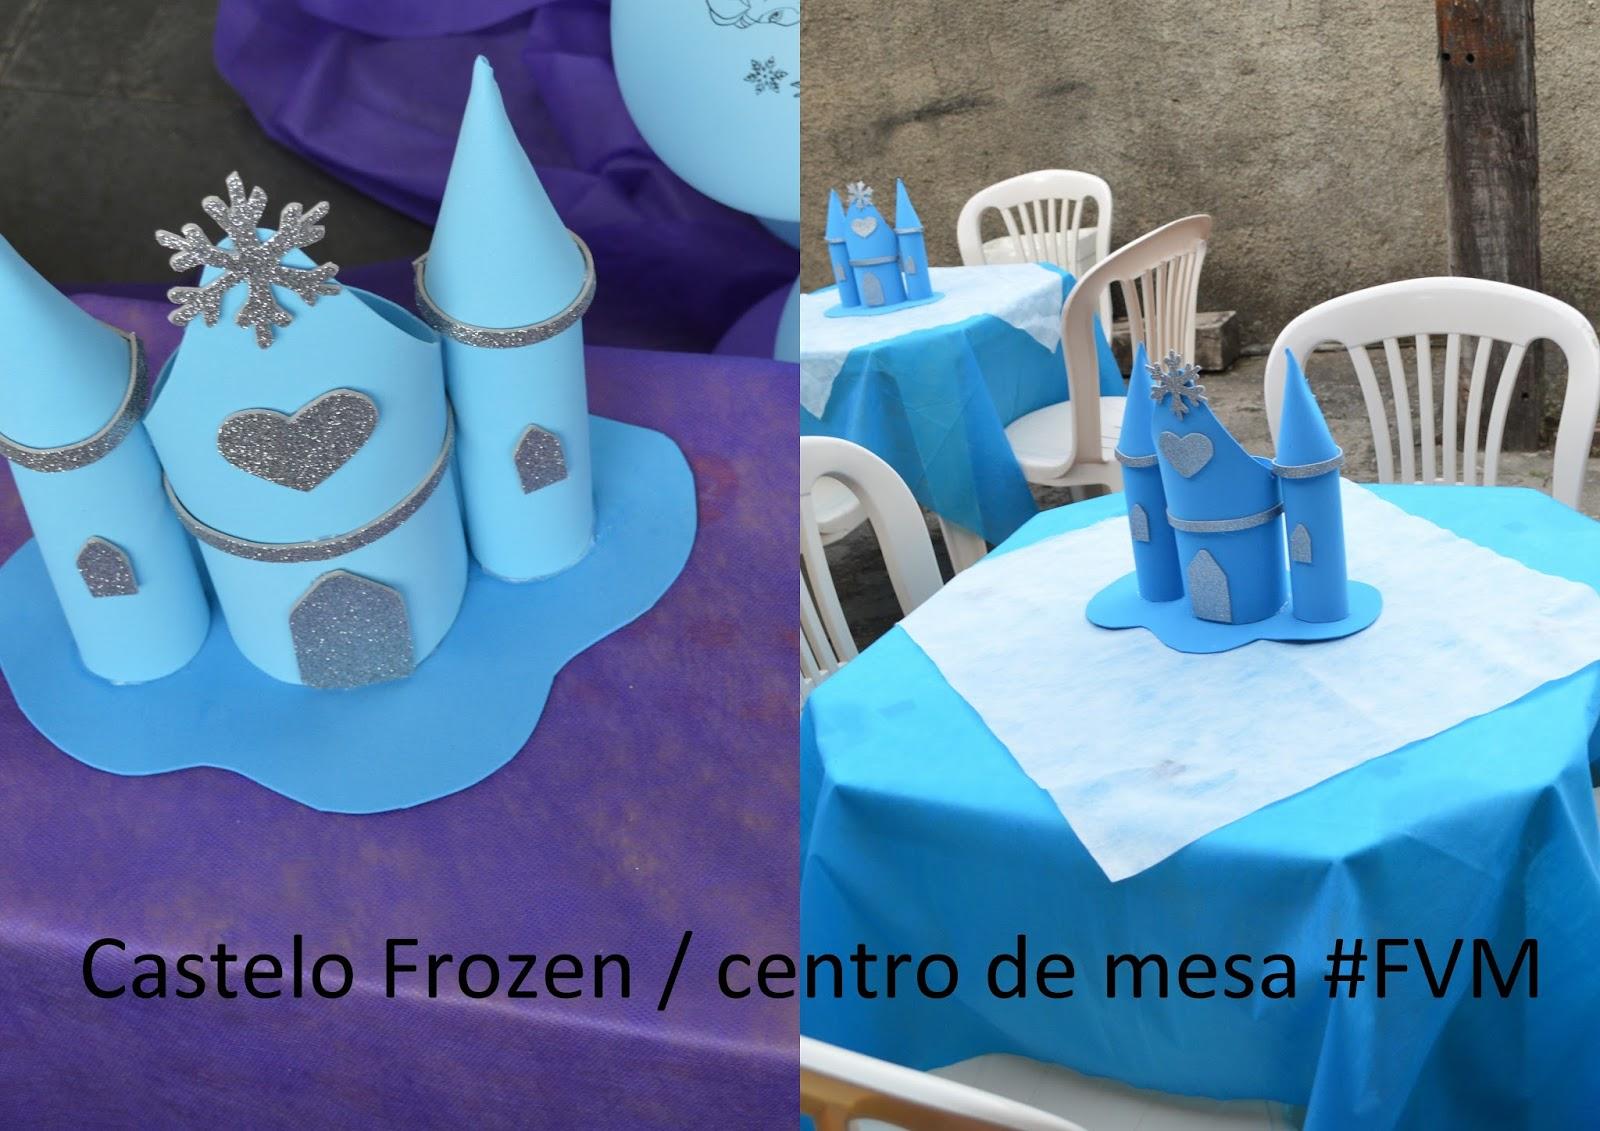 By Sayury Mendes Castelo Frozen Centro De Mesa Fvm Faça Você